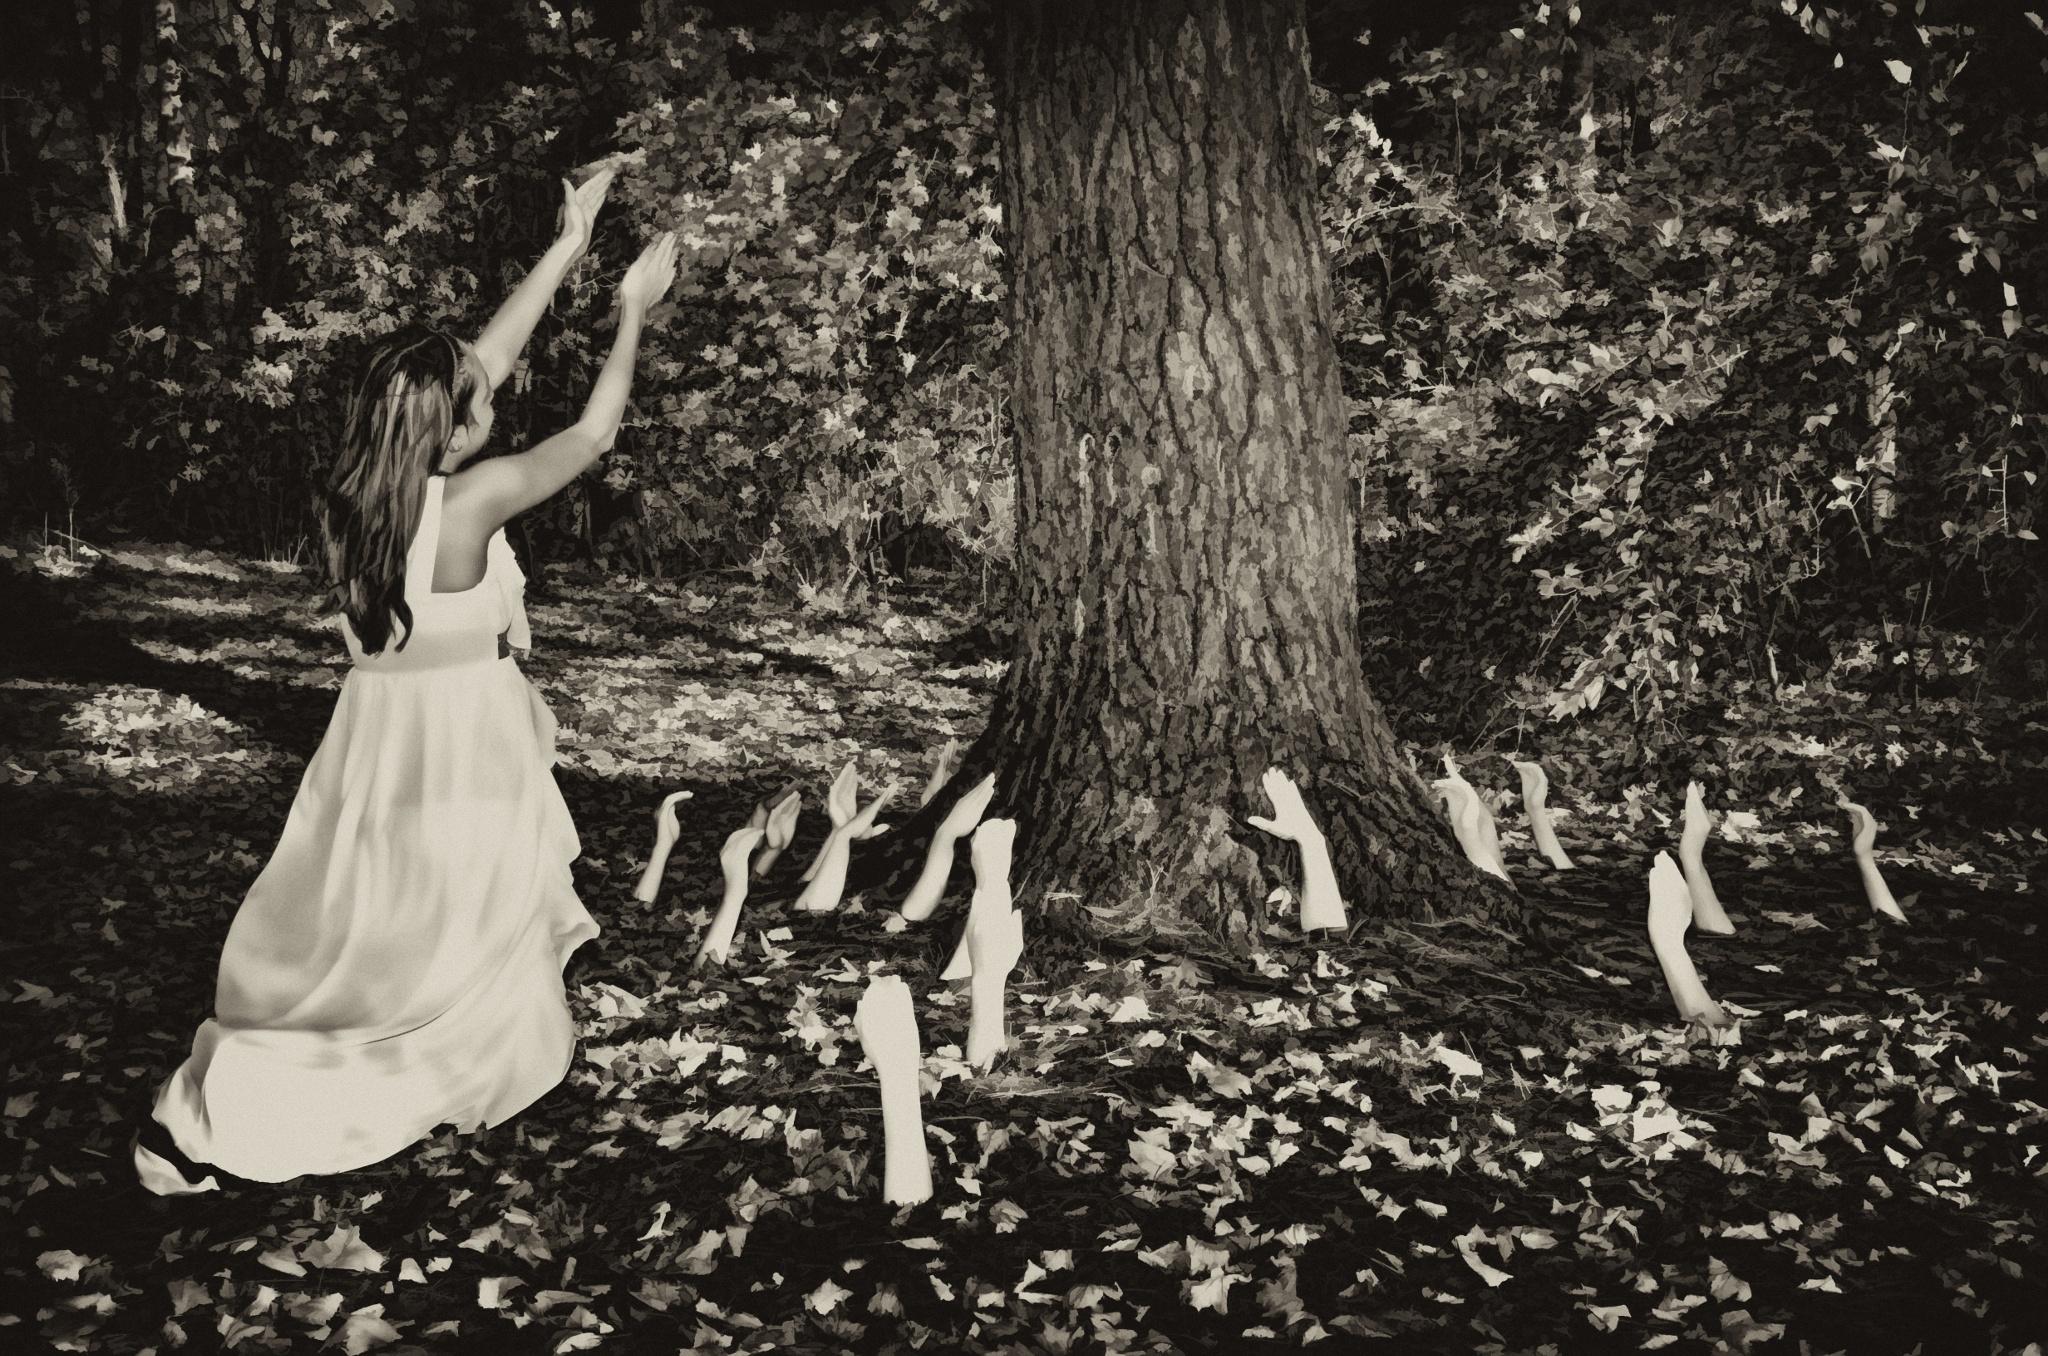 Nature Worship, by Hargrave Jennings